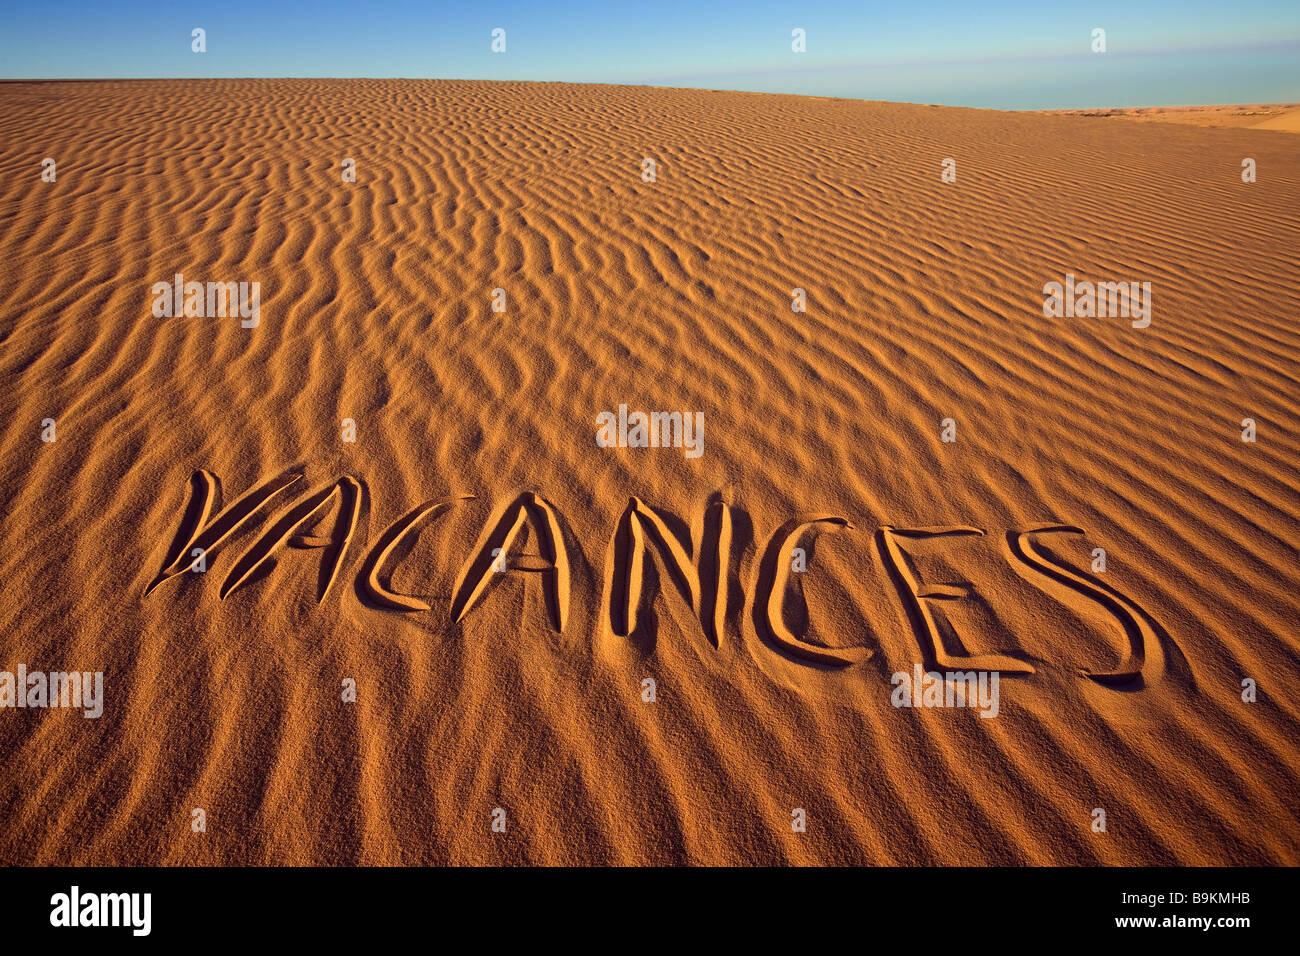 Mauritania, Adrar, Holidays written in the sand - Stock Image